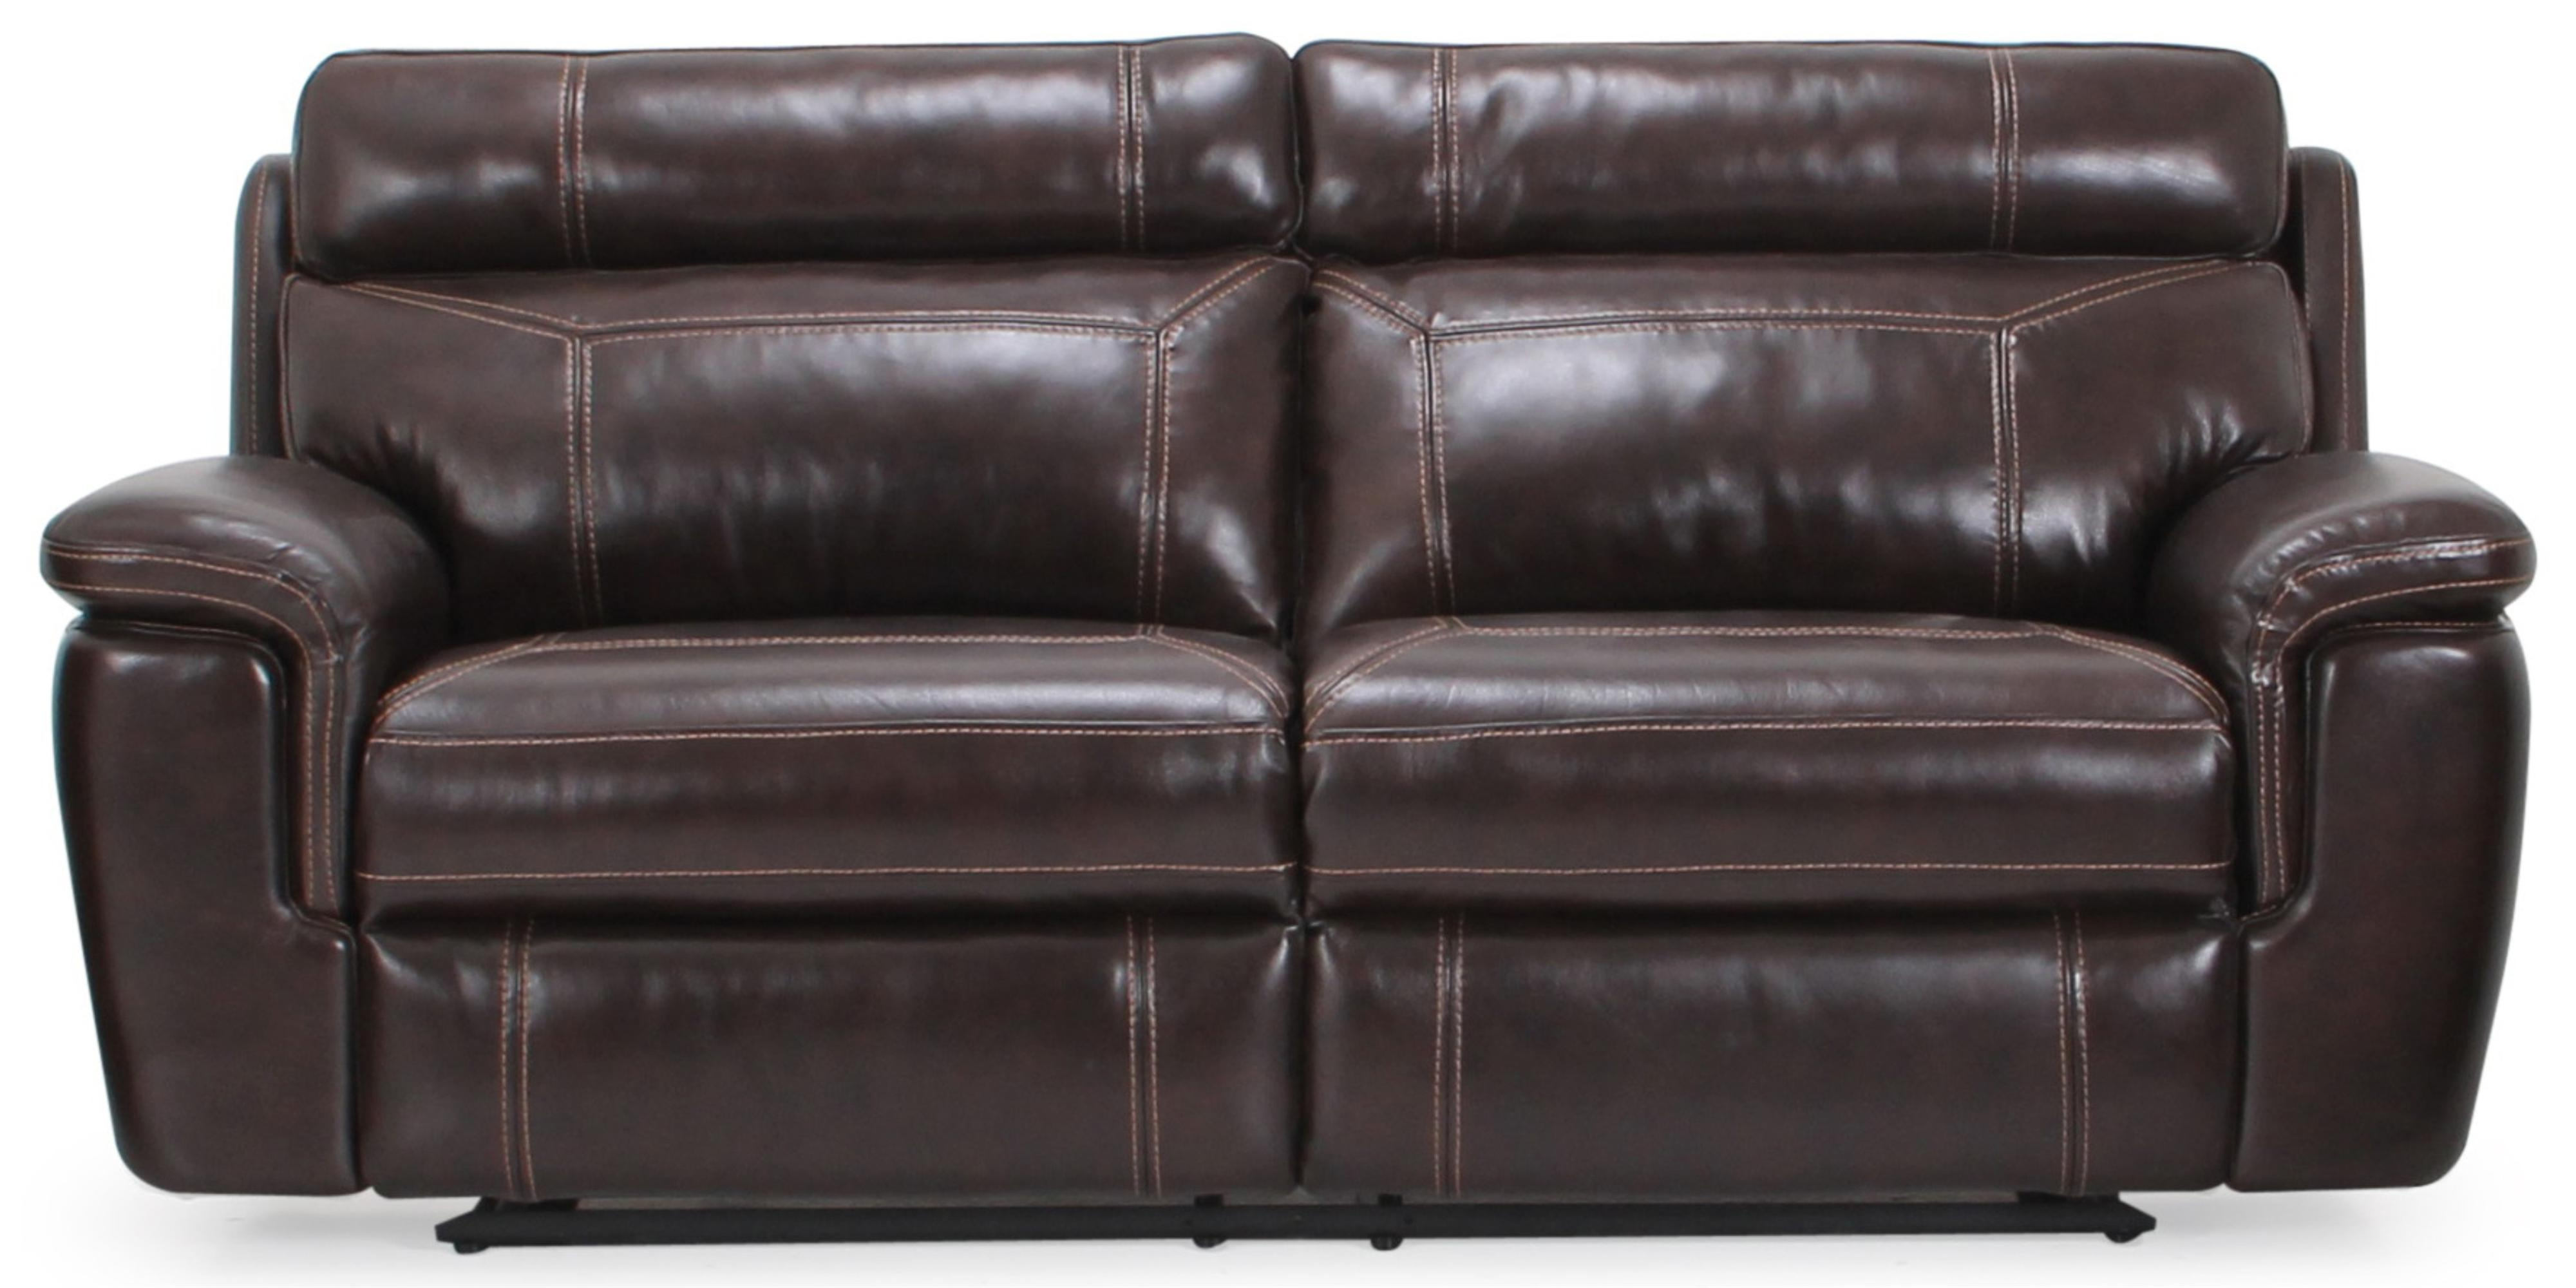 Htl 9176 Contemporary Power Reclining Sofa Fashion